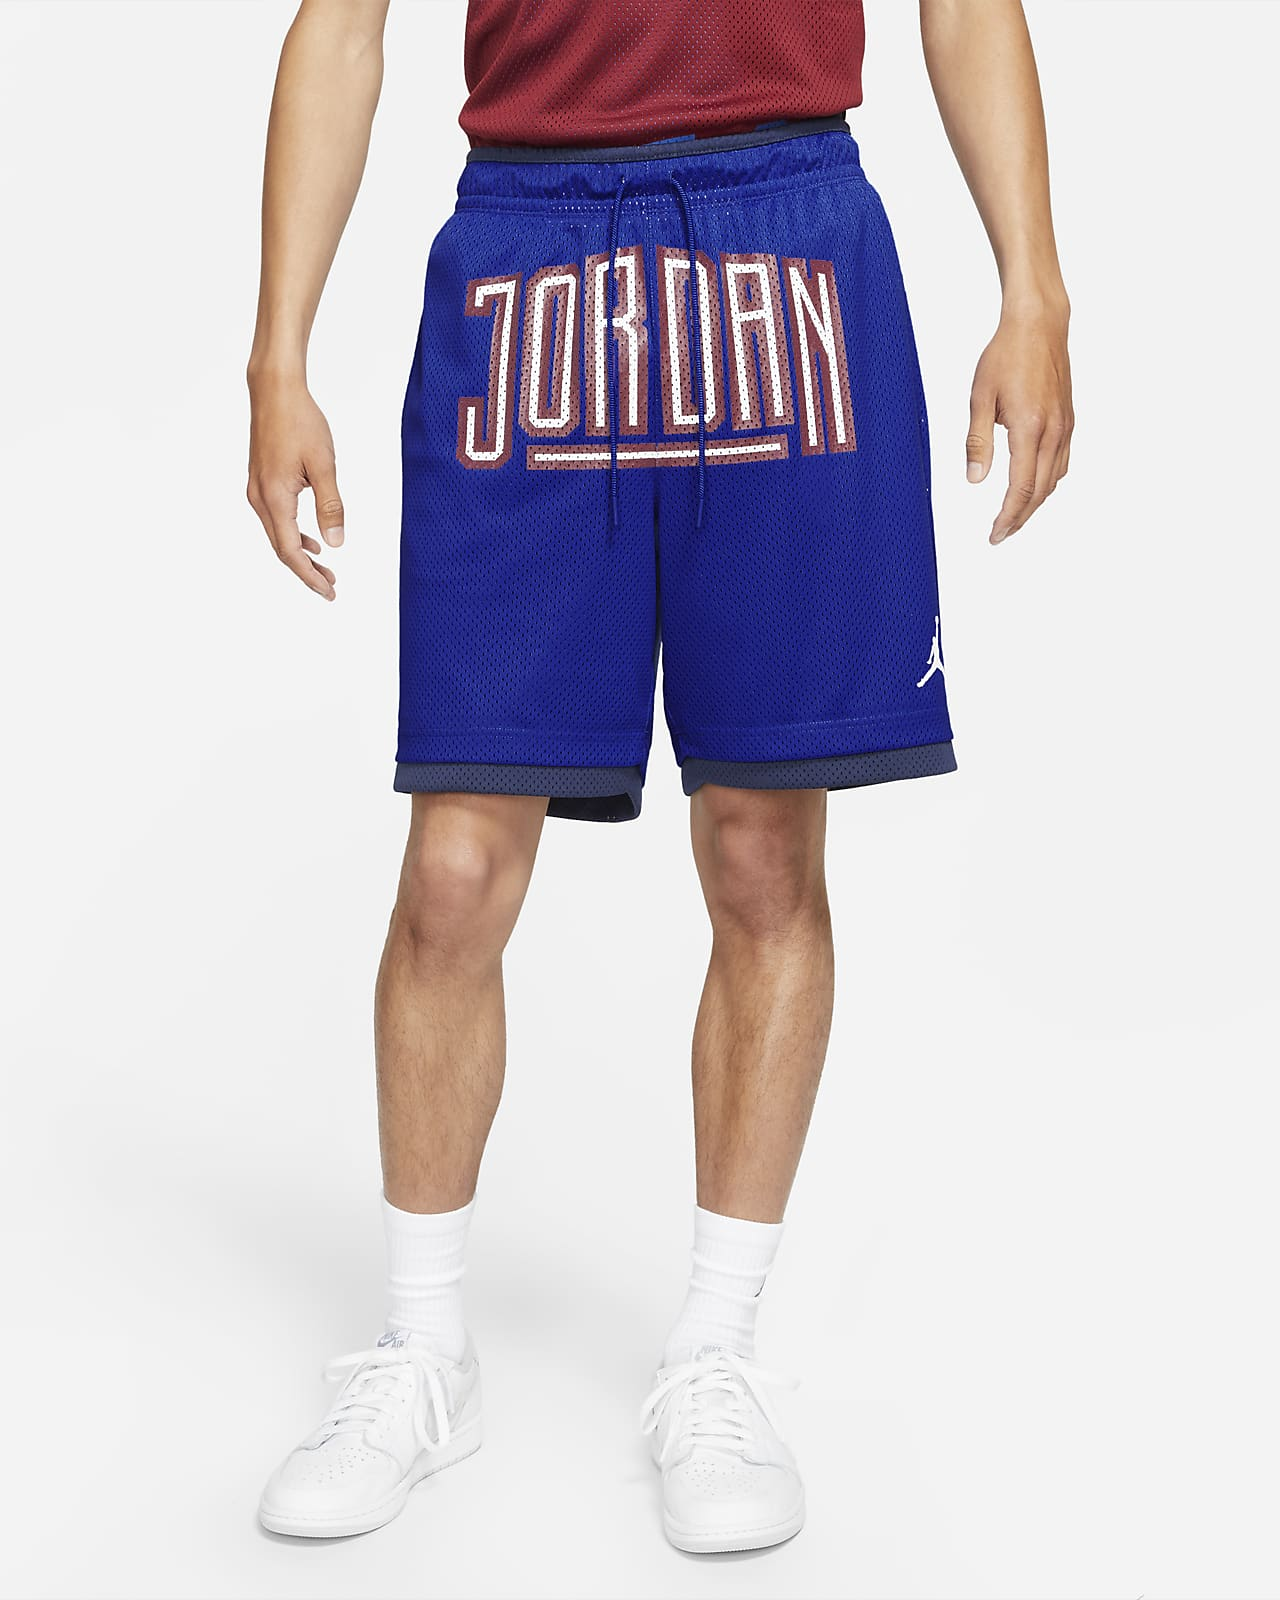 Jordan Sport DNA 男子短裤